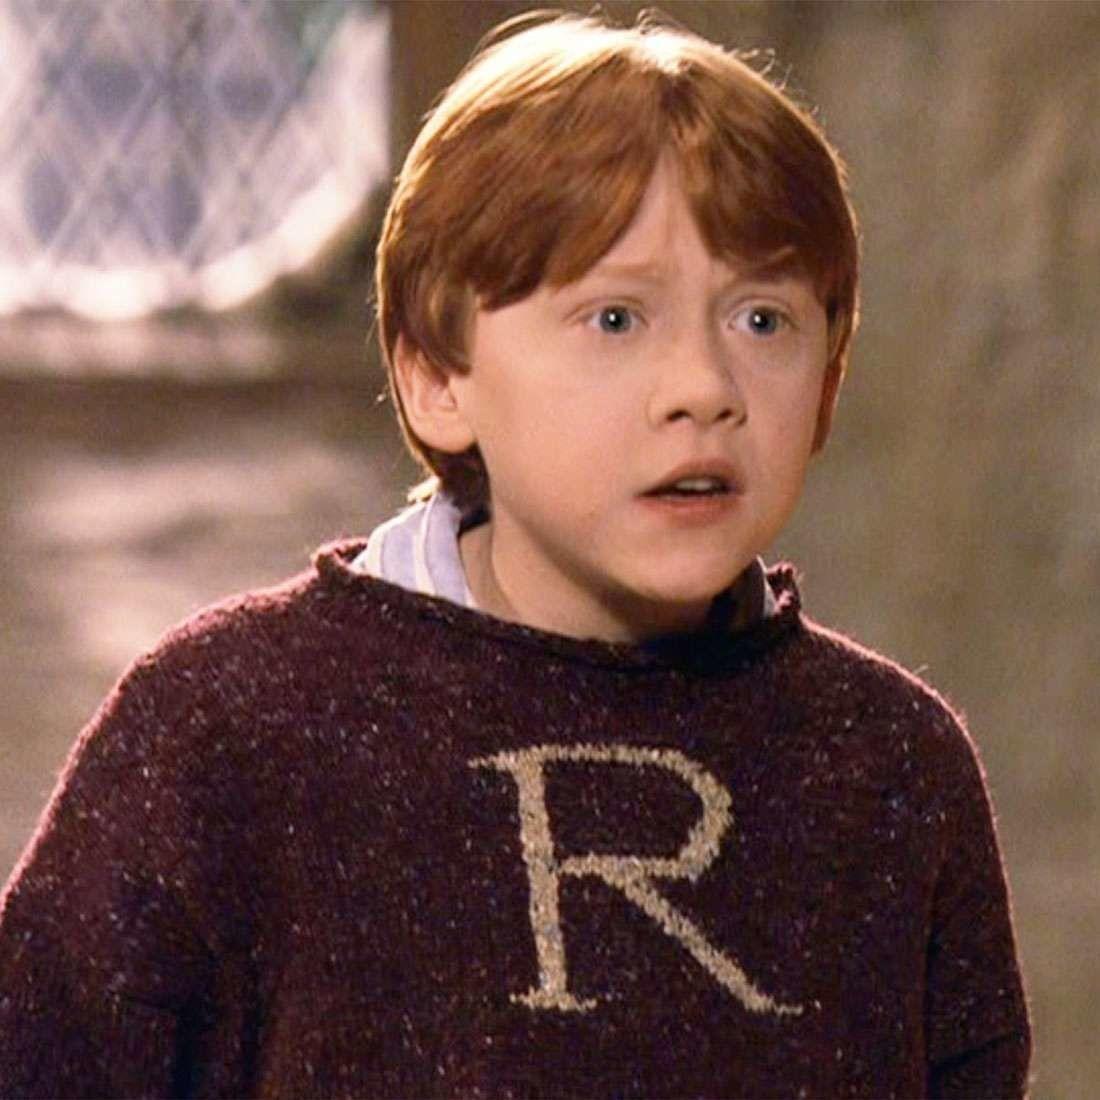 Pullover R De Ron Weasley Bordeaux Xl Harry Potter Wizarding World Personnages Harry Potter Harry Potter Film Harry Potter